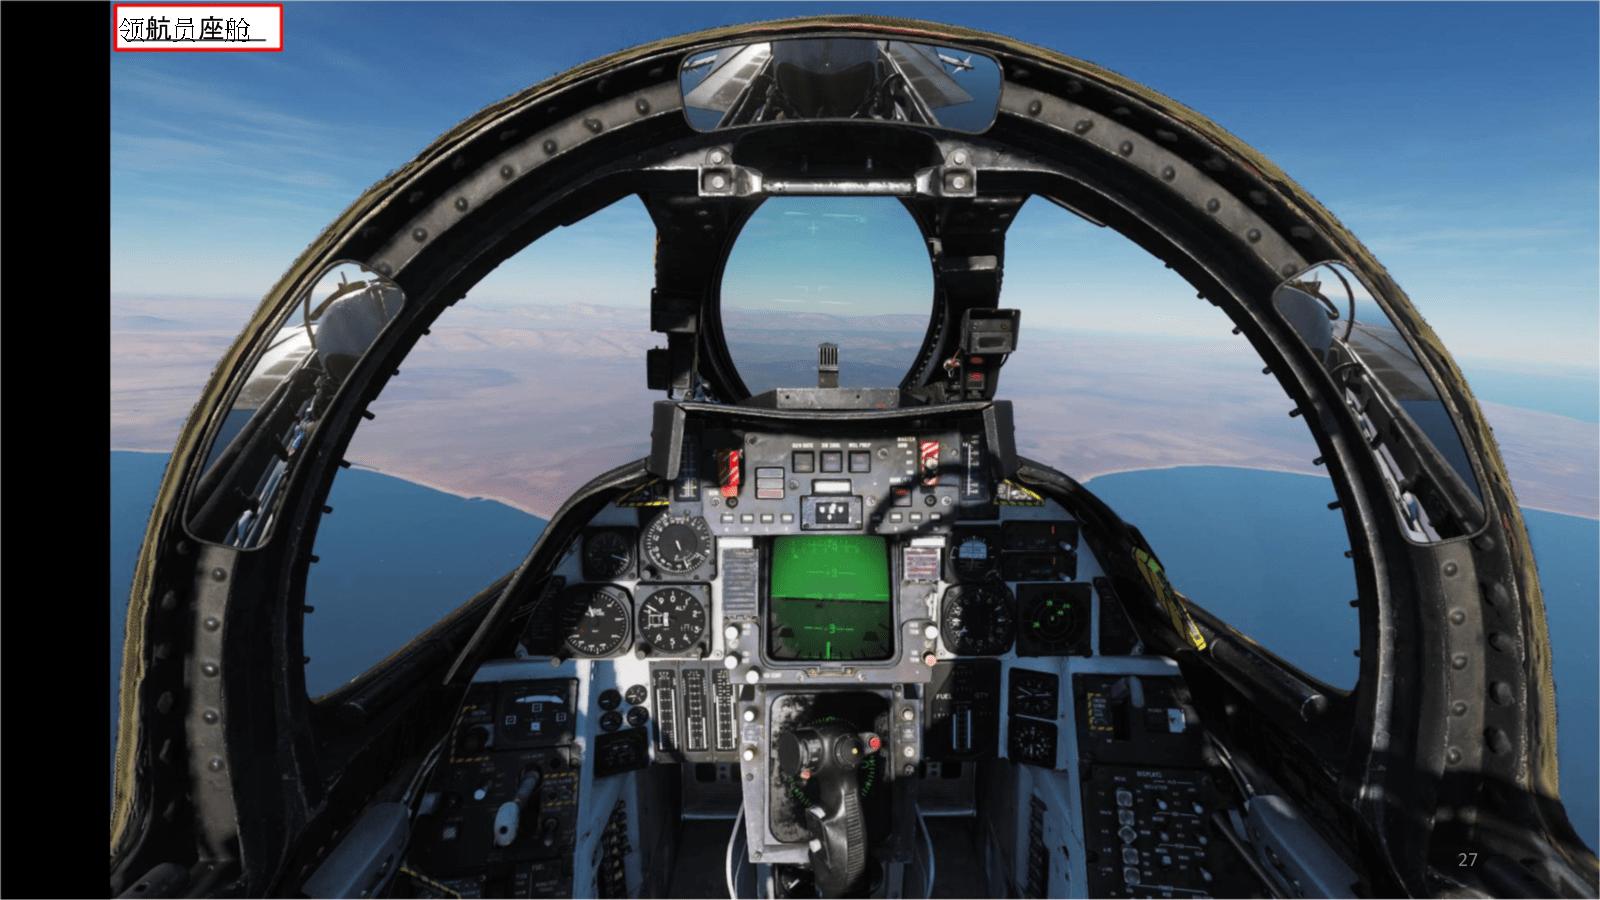 DCS F-14B Tomcat熊猫战斗机 中文指南 3.1.1.1右面板.docx